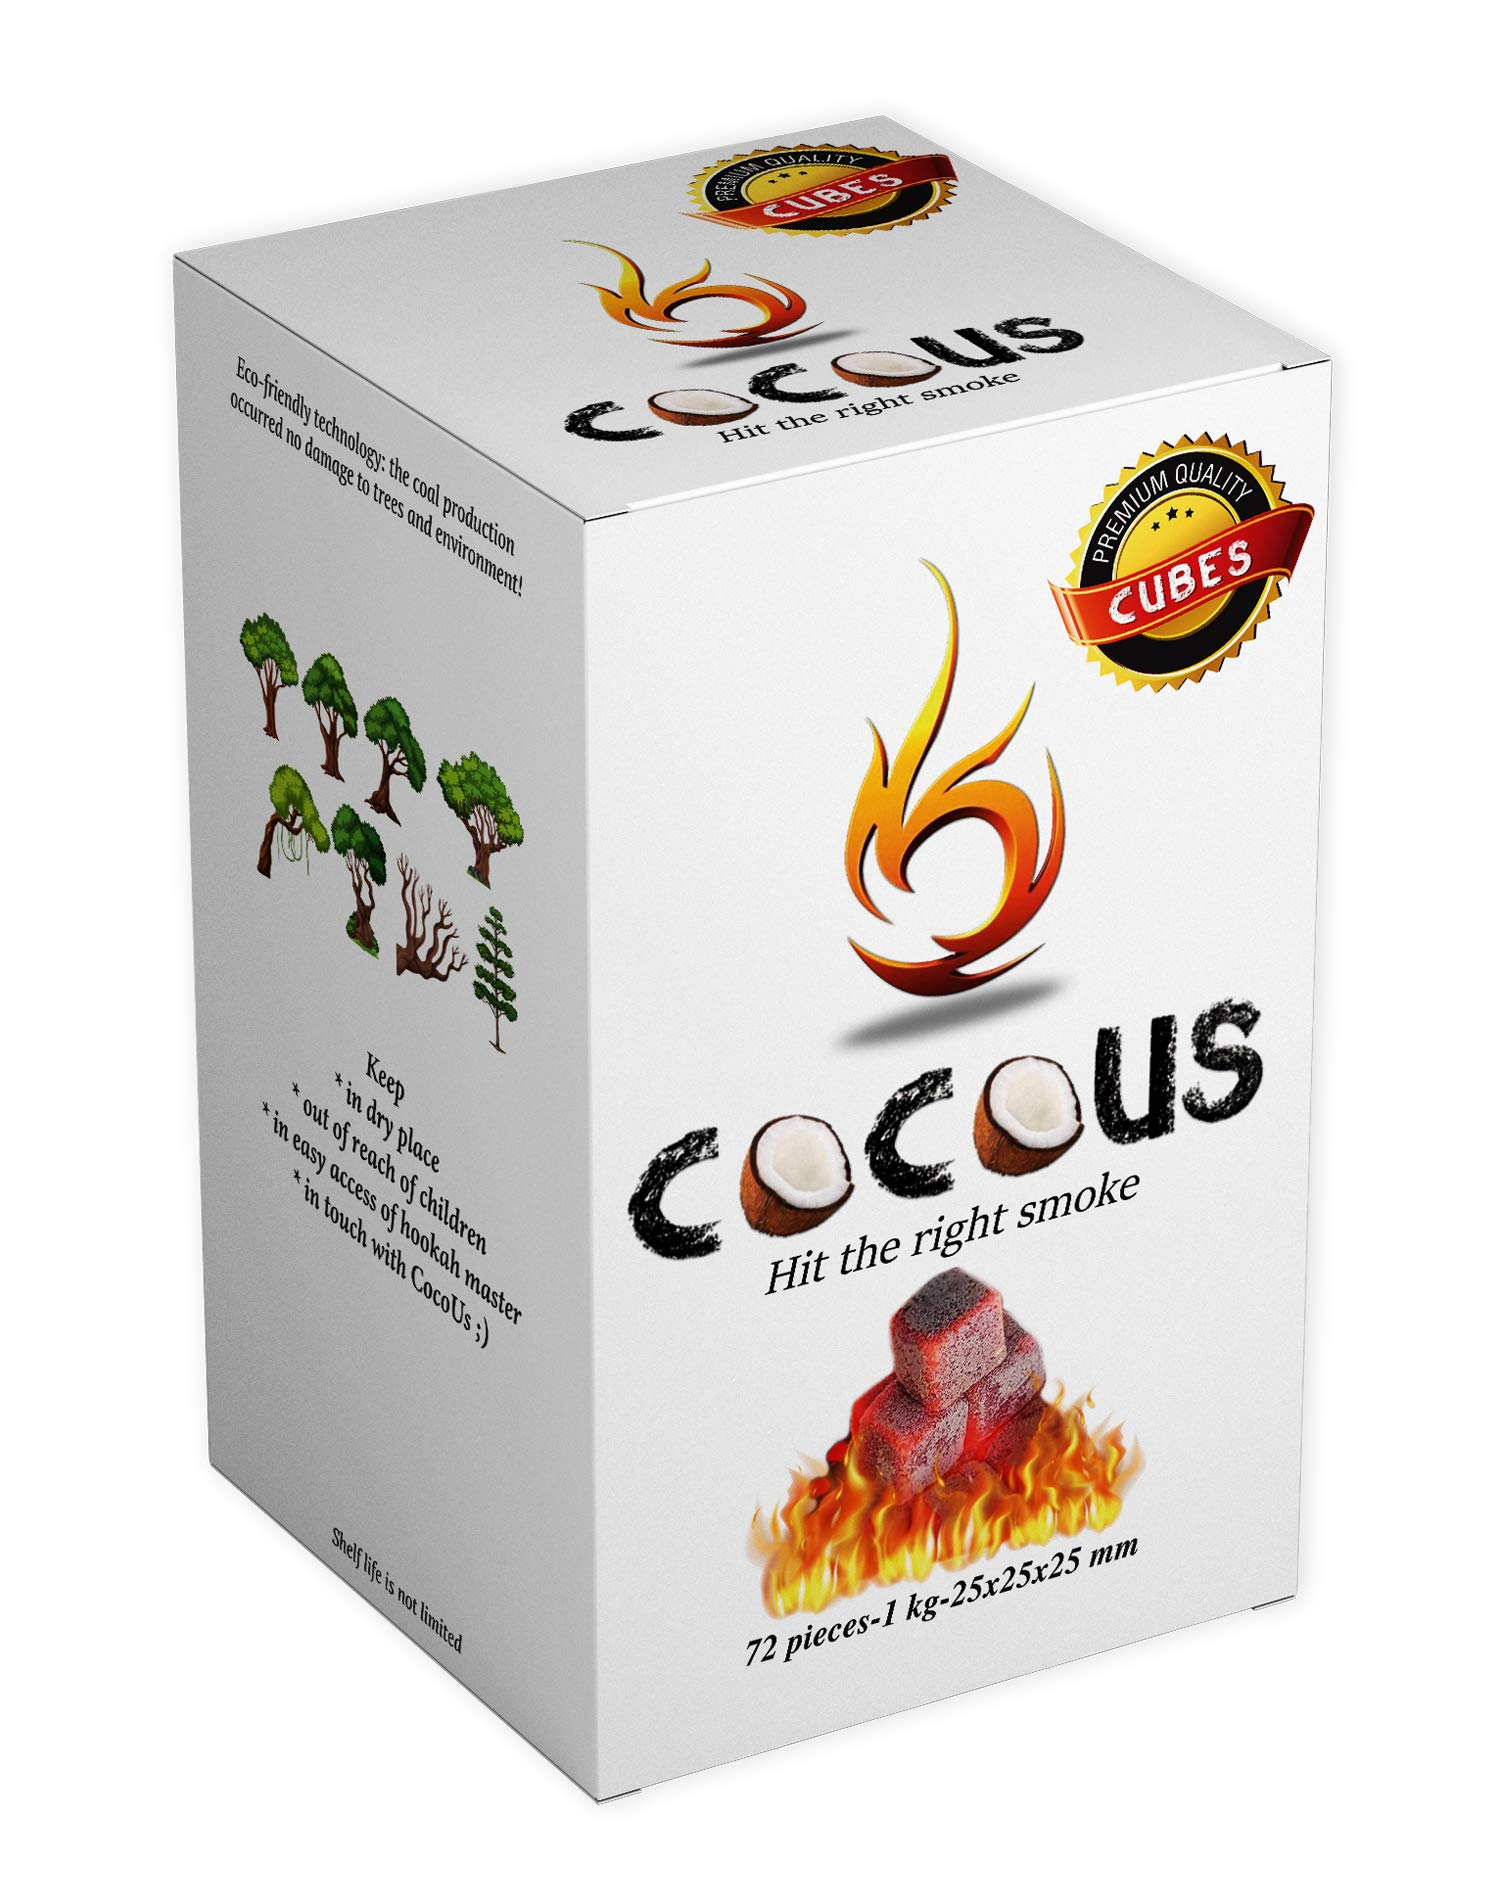 Cocous Natural Coconut Charcoal Incense Hookah Shisha Narguile Coal Coconut Shell Briquette Coals 1KG-72 Pieces 25mm Cubes